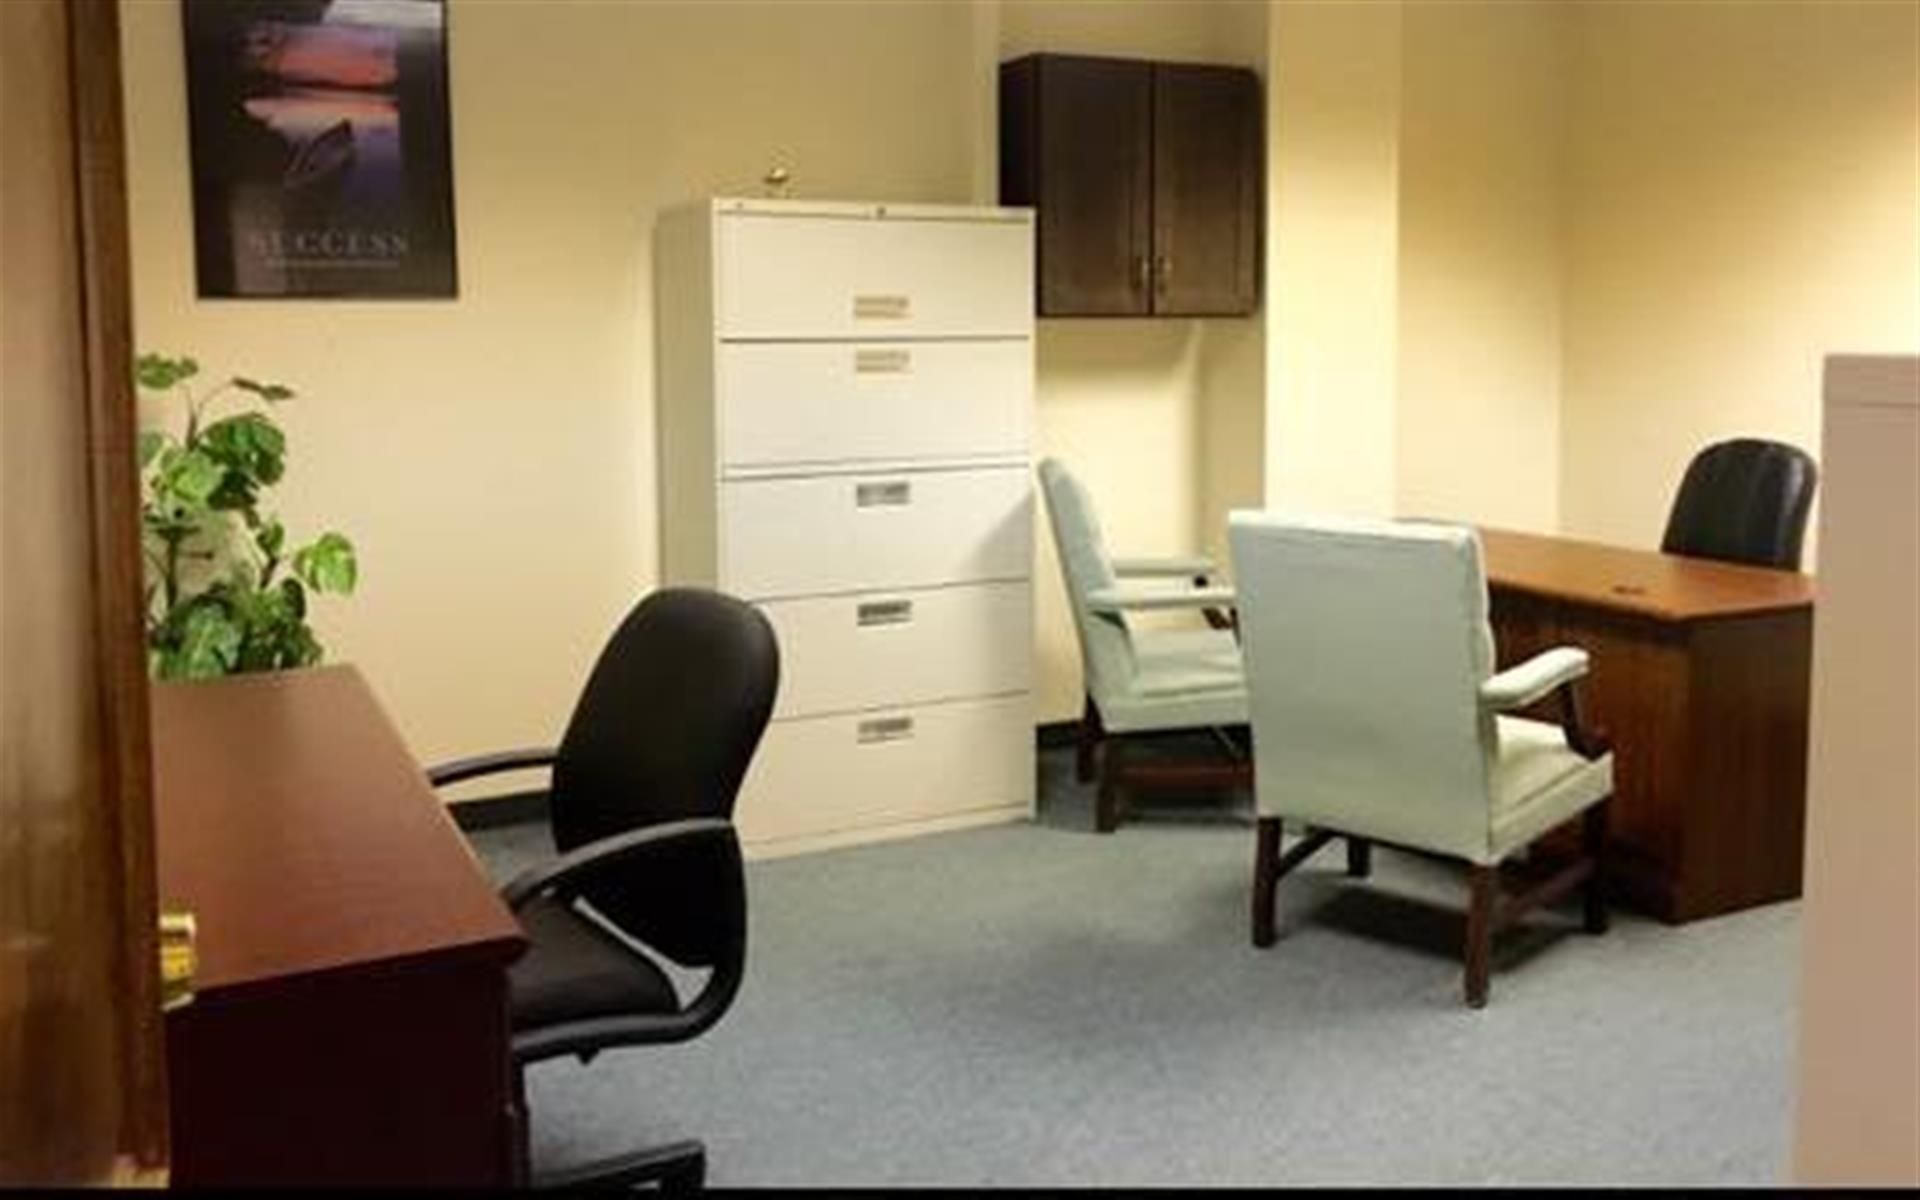 CEO Nashua, Inc. - Office #35